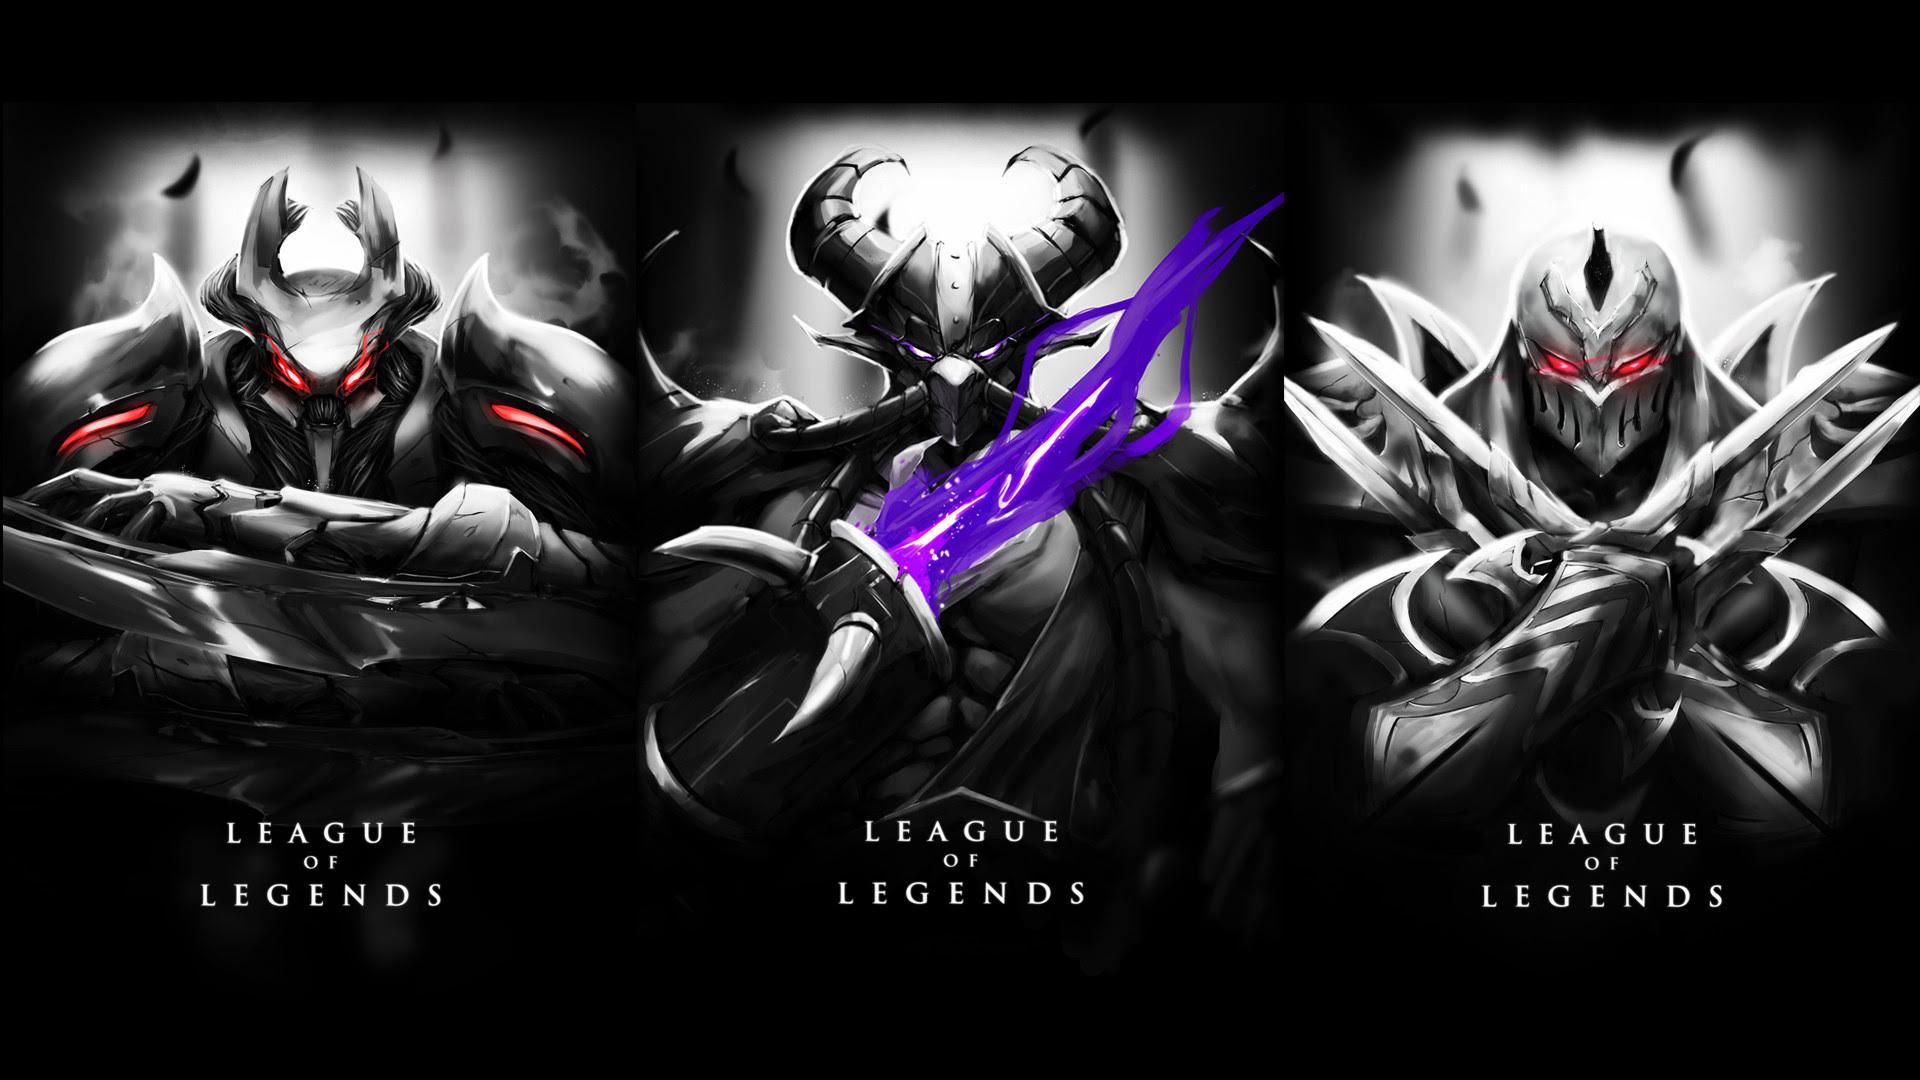 League Of Legends Wallpaper 1920x1080 42787